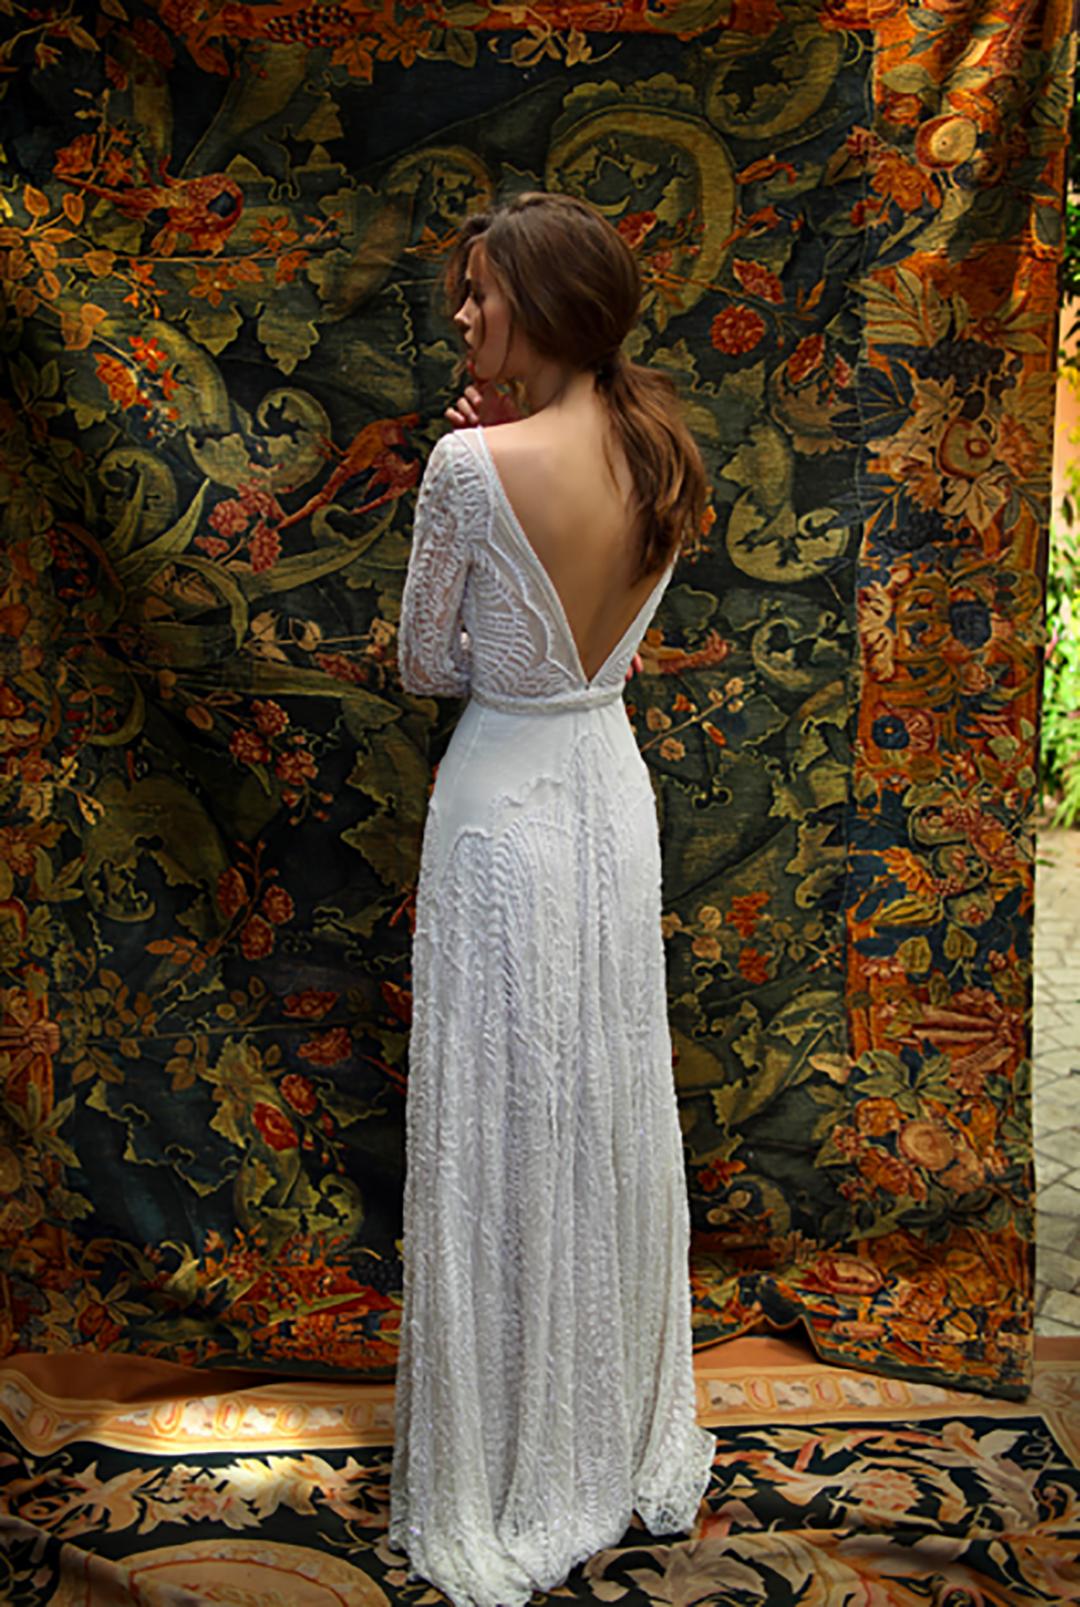 9145c6013ef3 A UK Wedding Blog focusing on Festival Wedding Inspiration | My ...